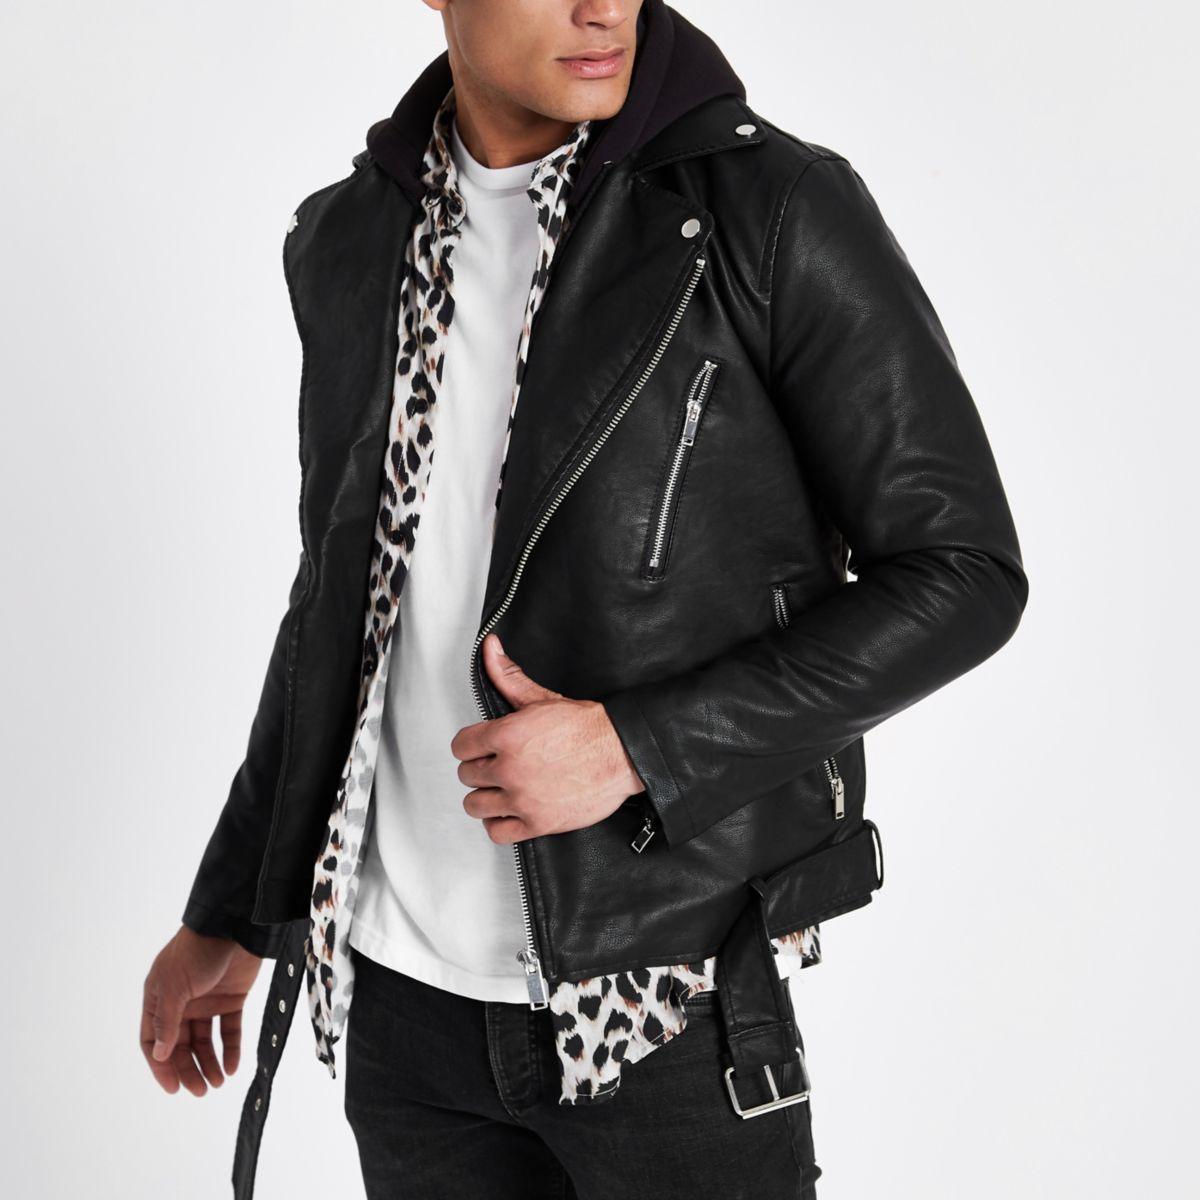 Black hooded faux leather biker jacket Clothes, Faux